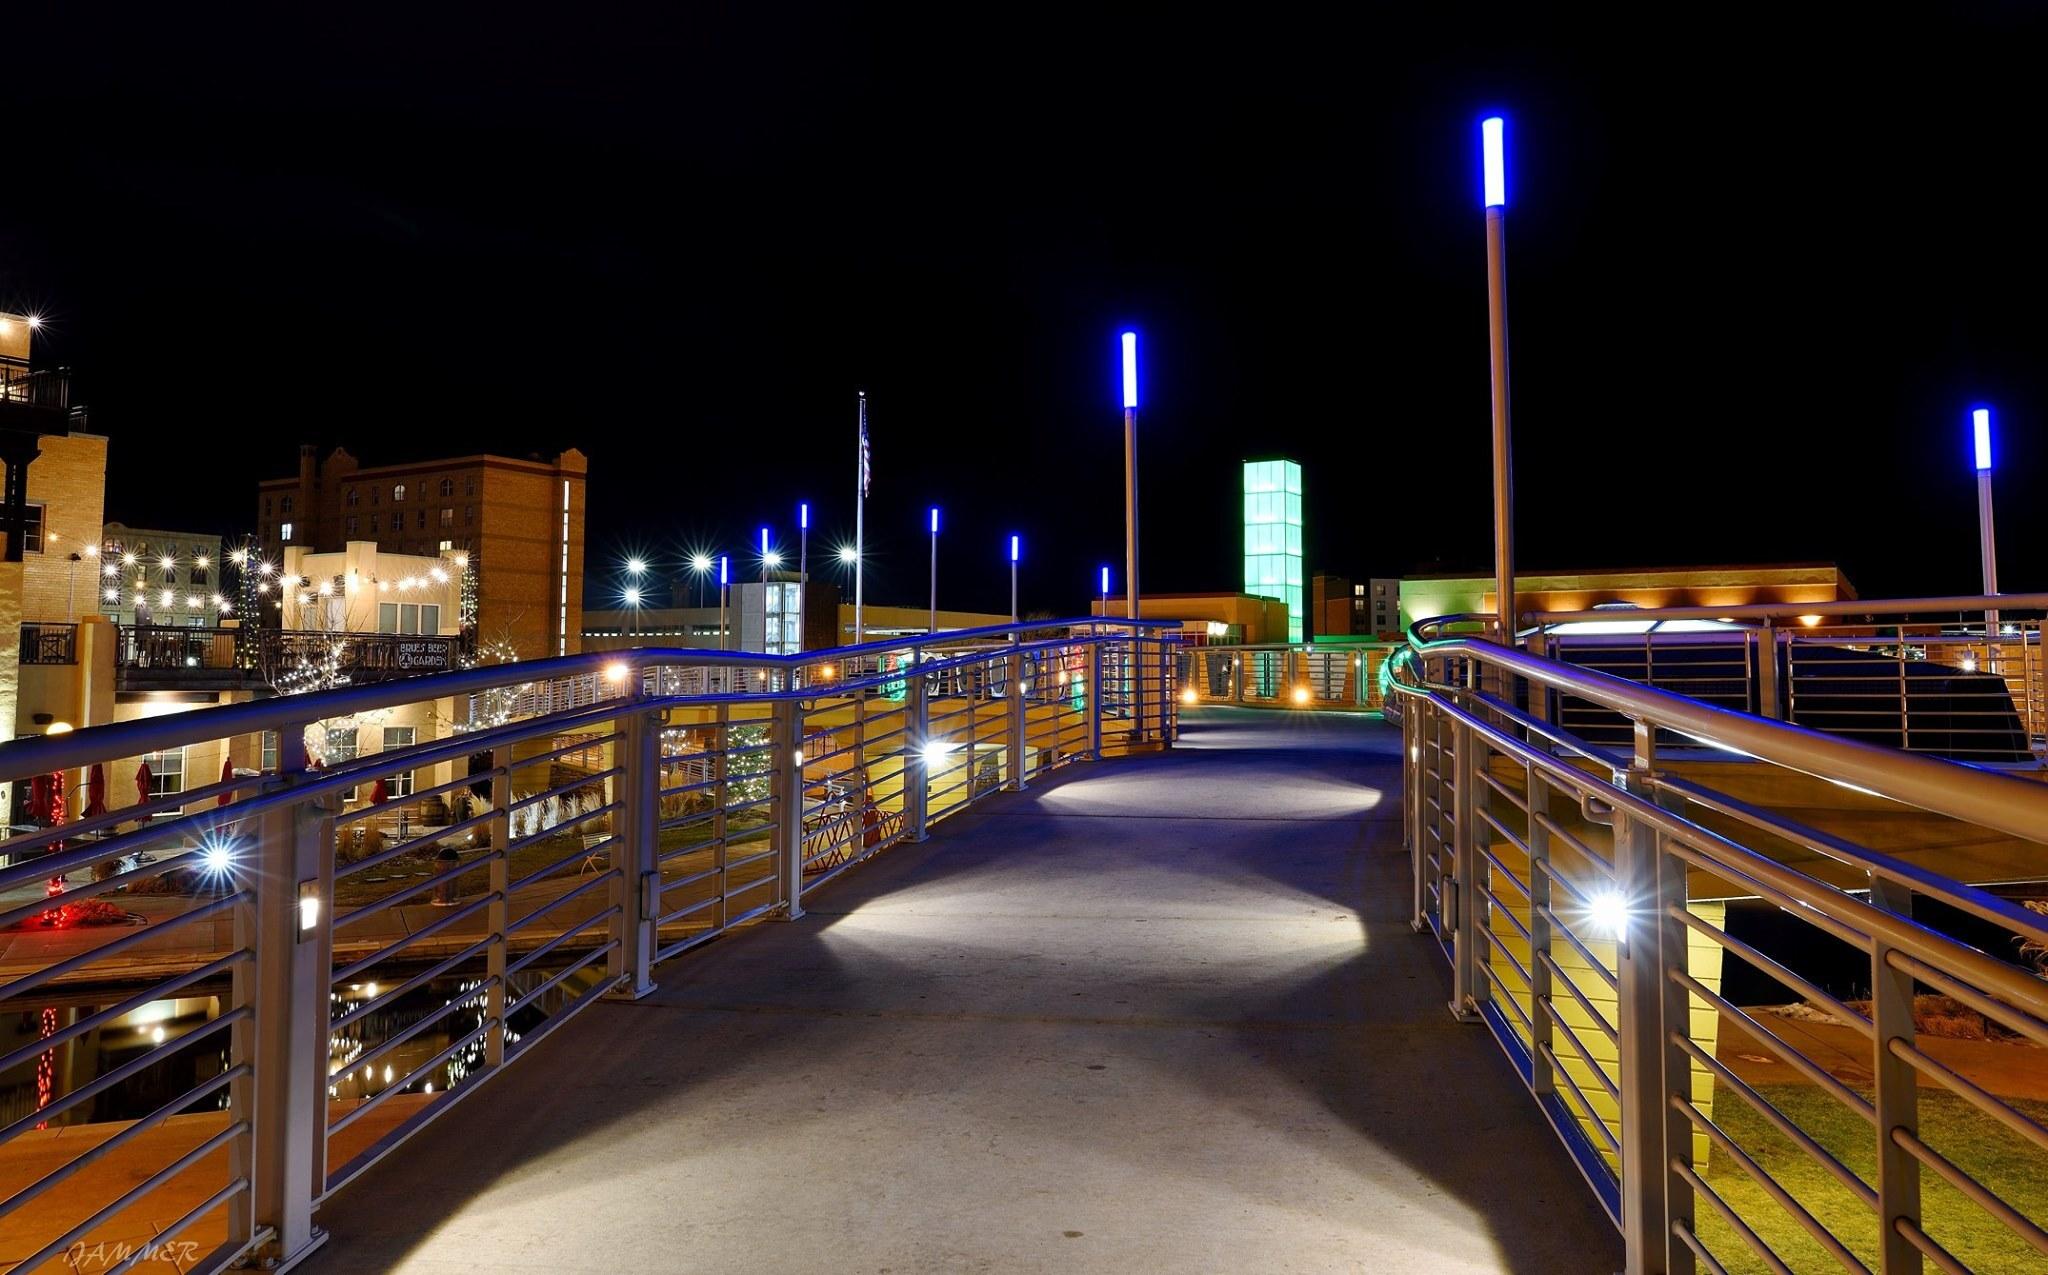 Pueblo at night